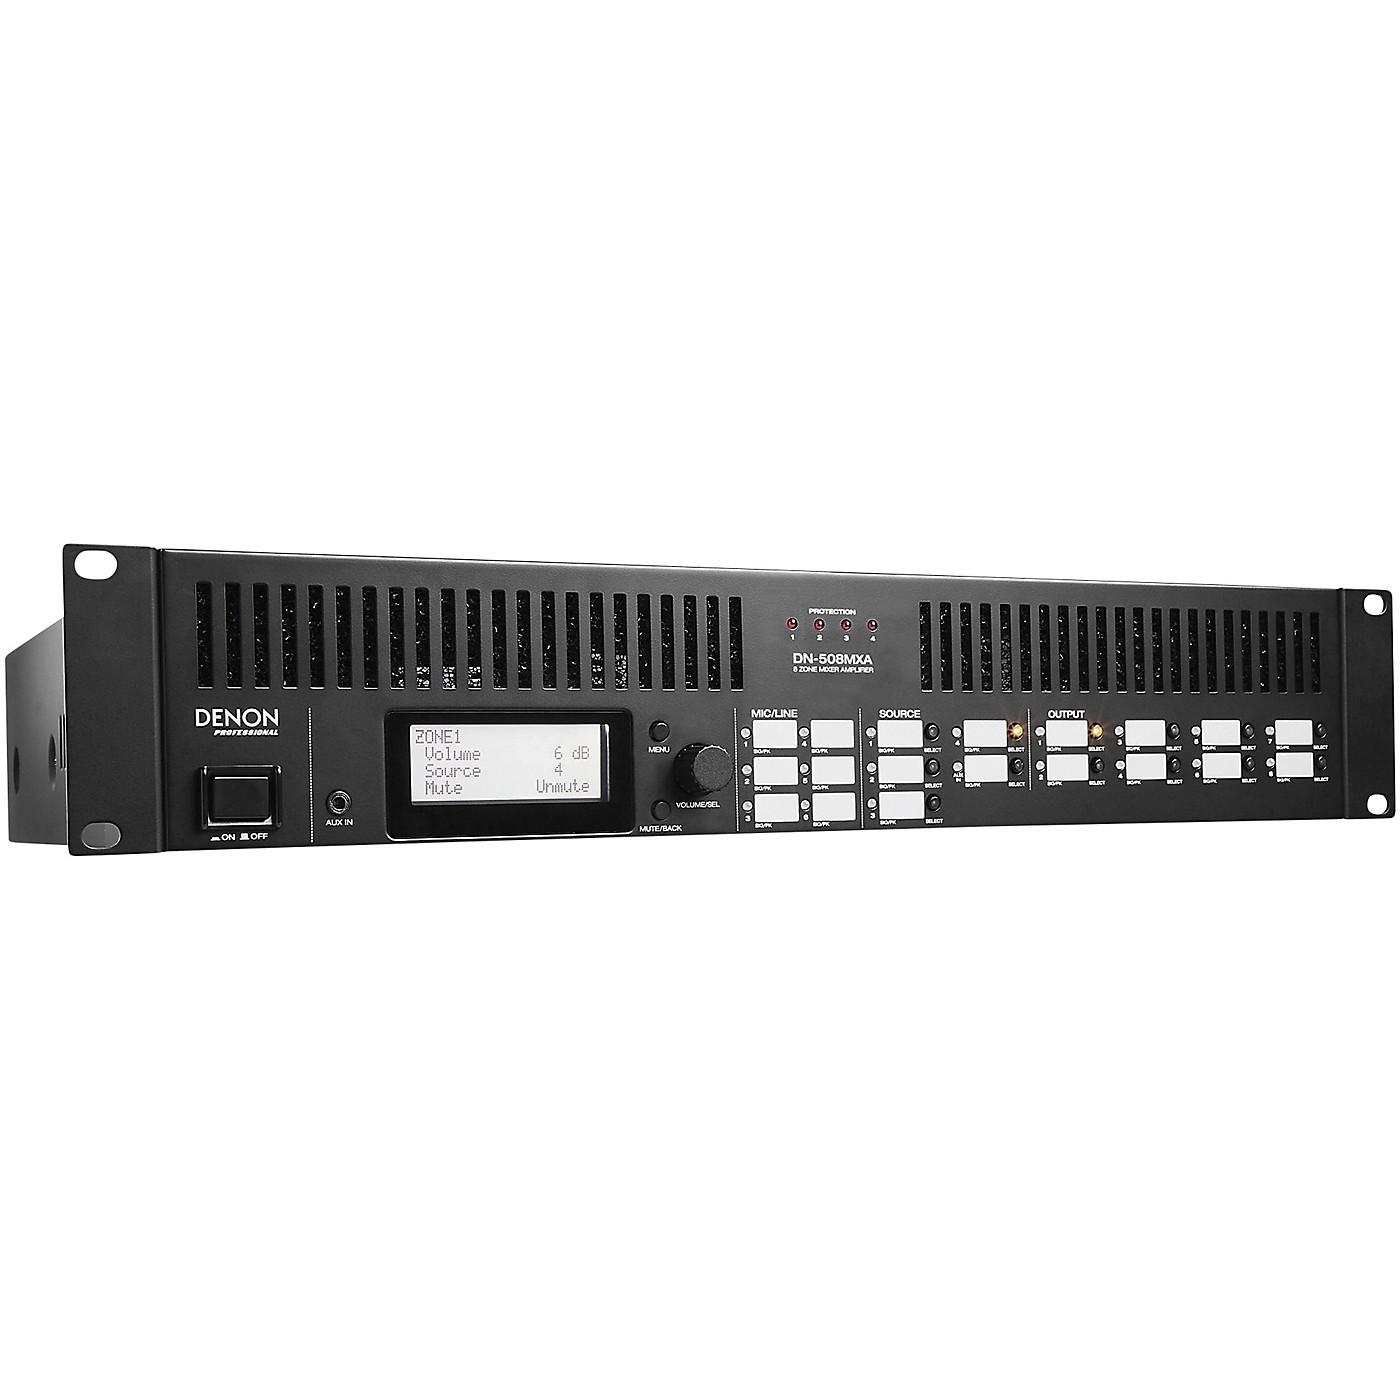 Denon Professional DN-508MXA  8 Zone Mixer With 4 Zone Amplifier thumbnail